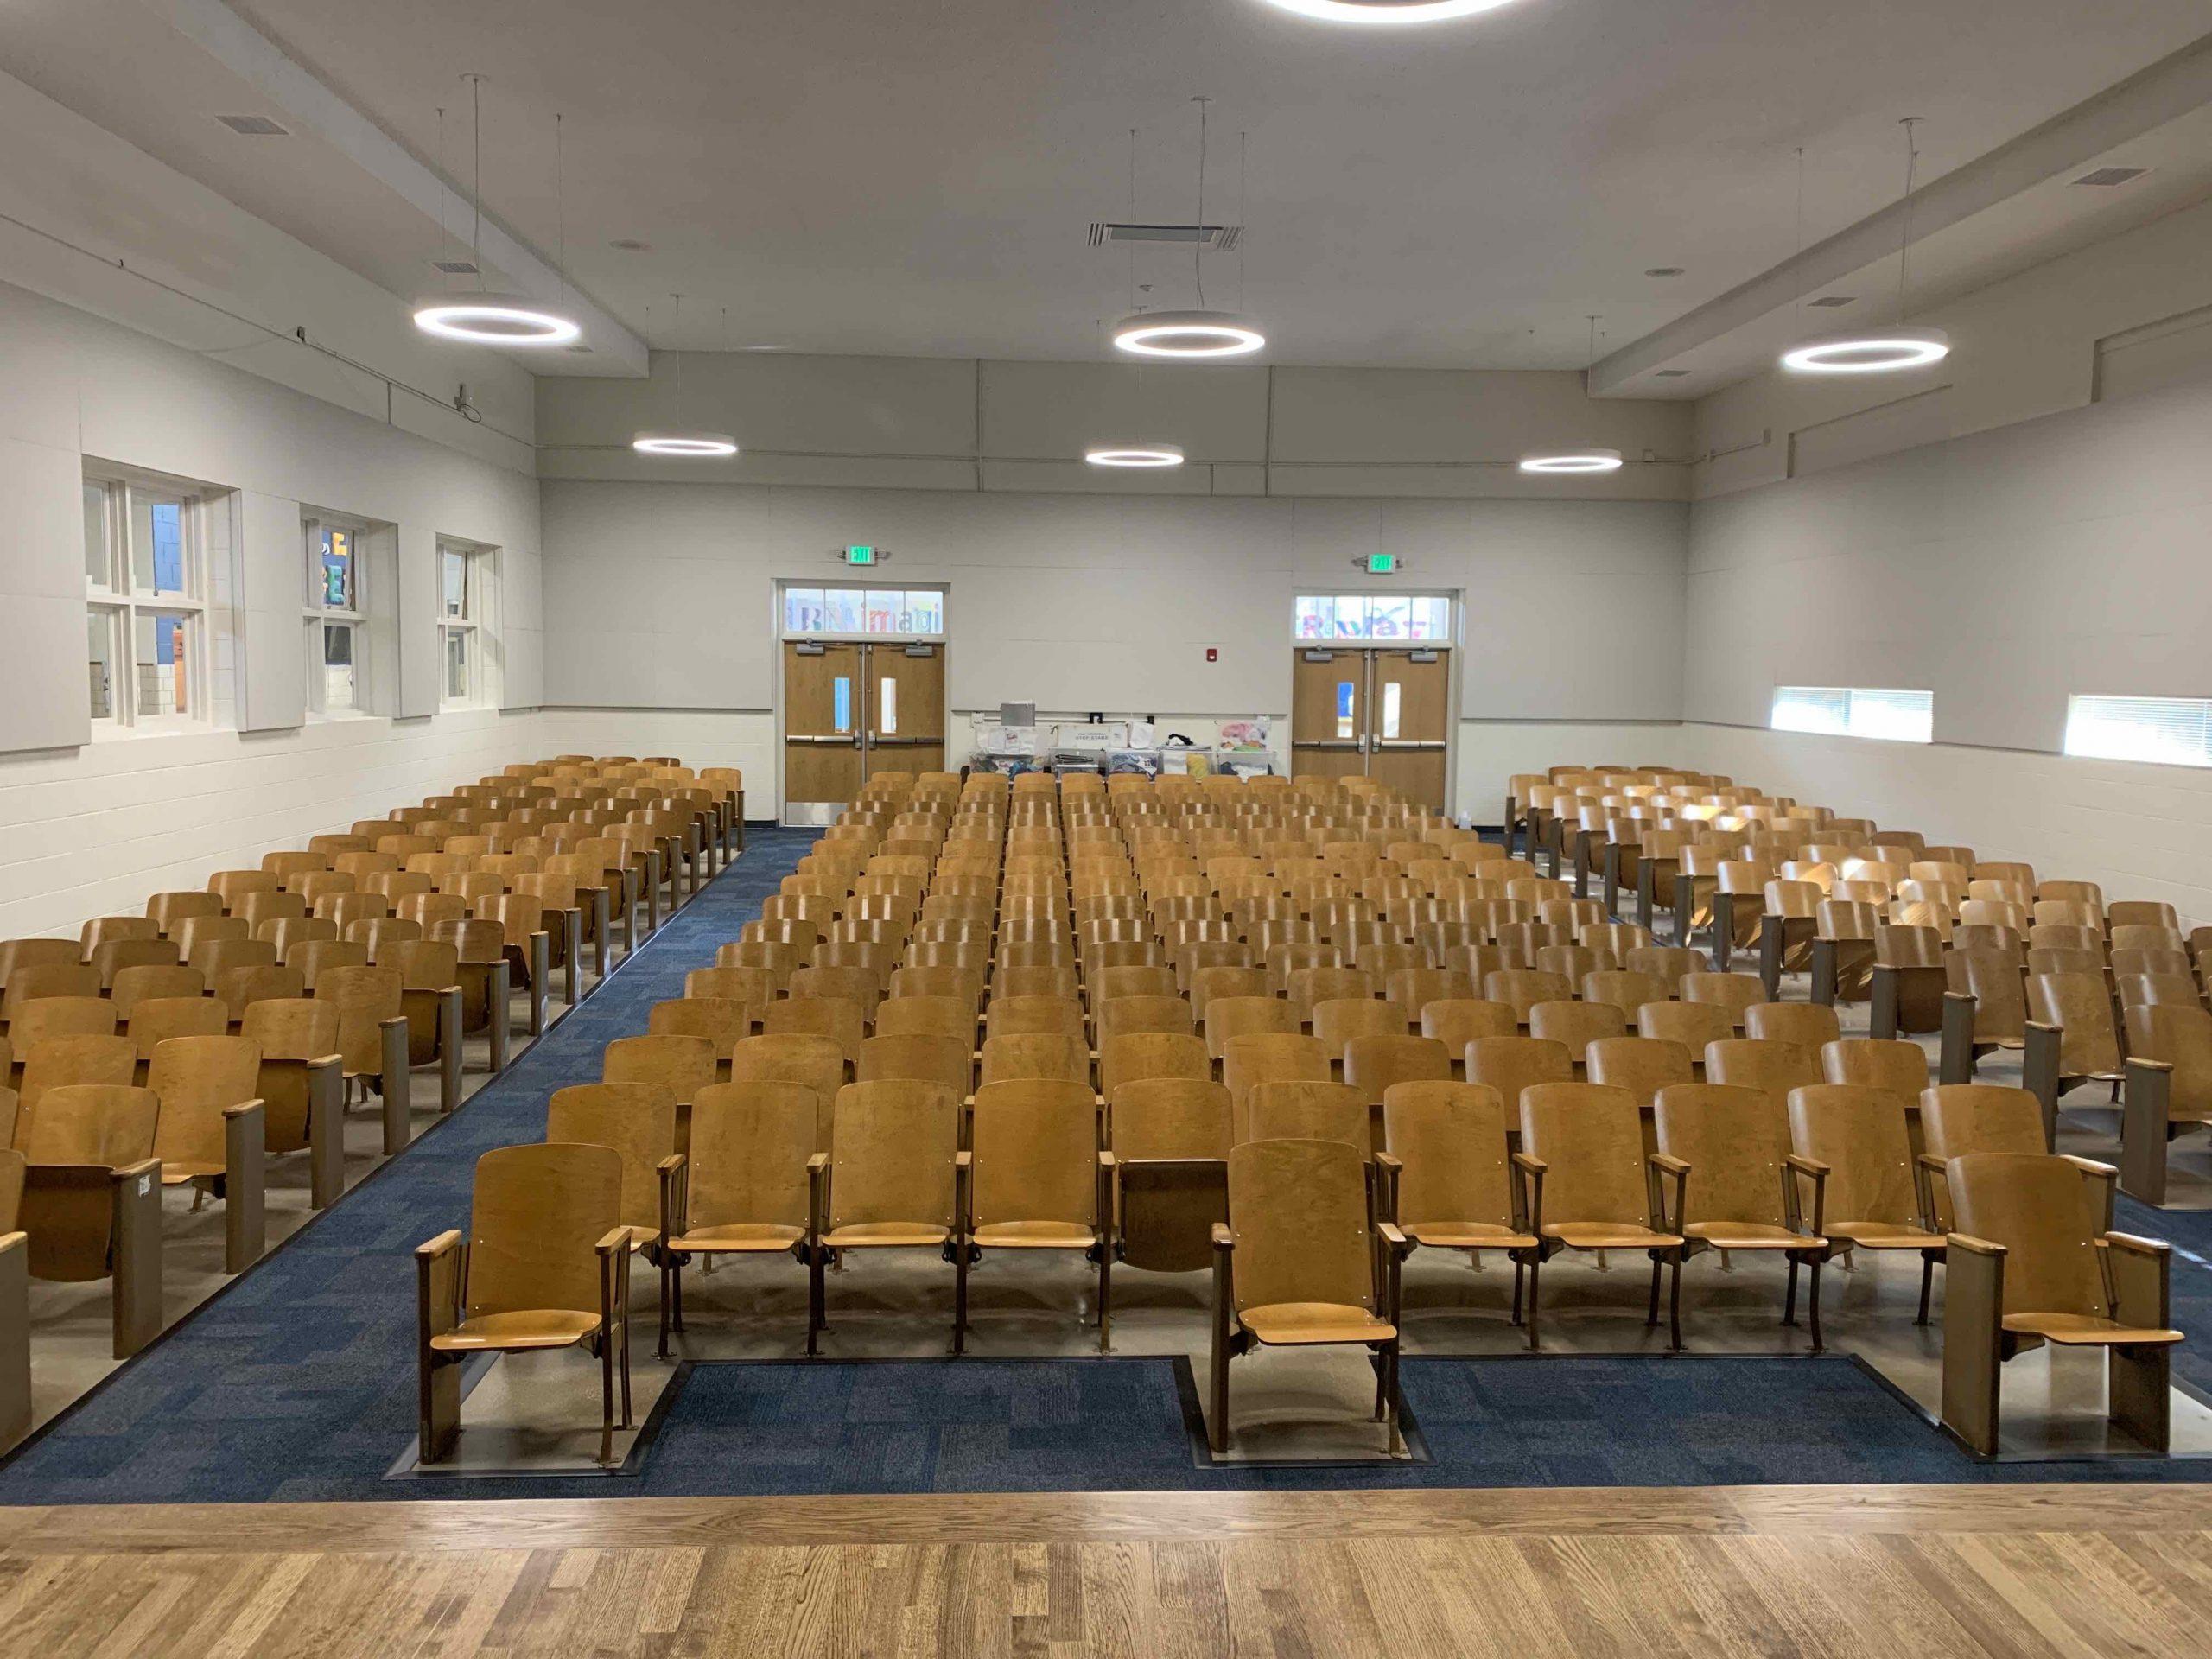 The Auditorium is Complete! image 0